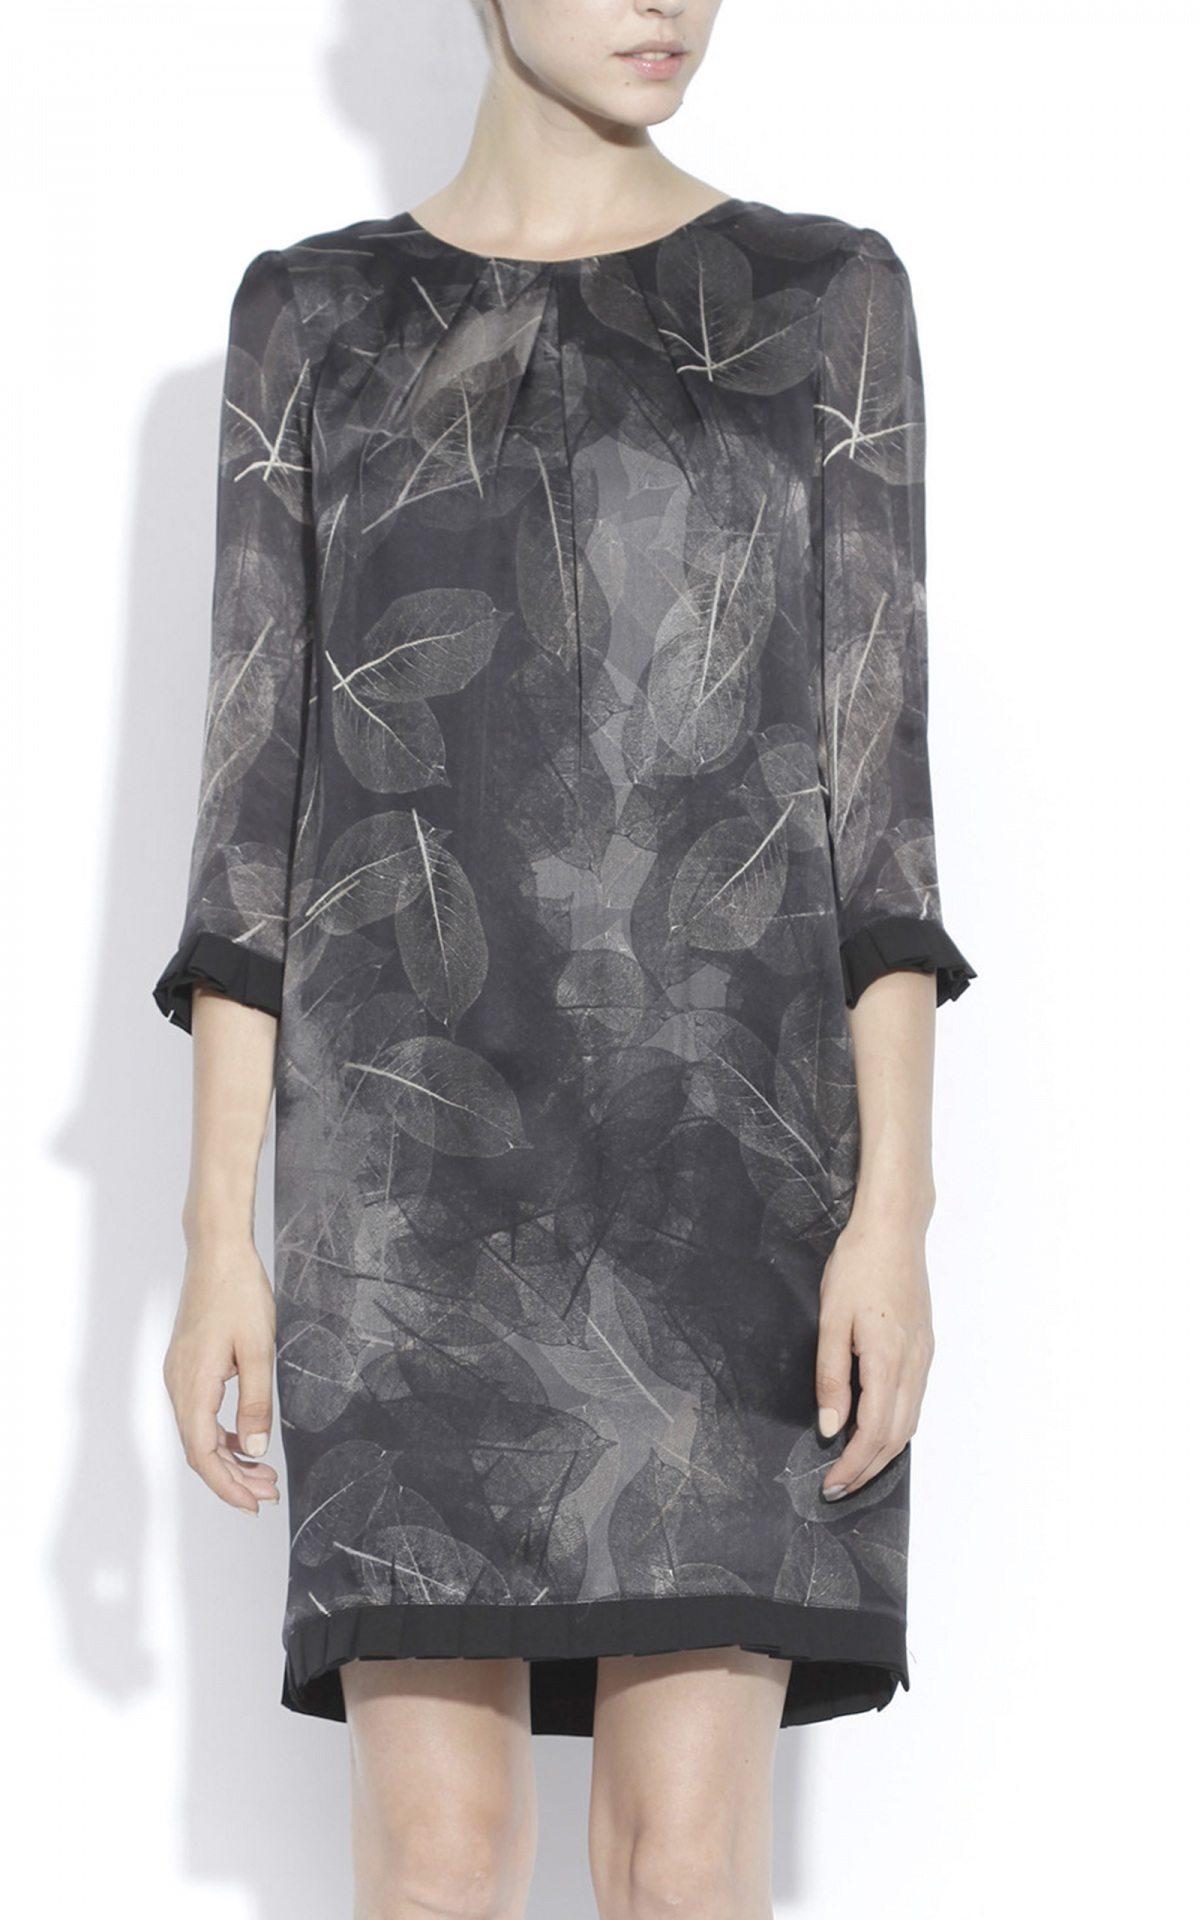 Rochie midi cu print abstract Imprimat/Gri